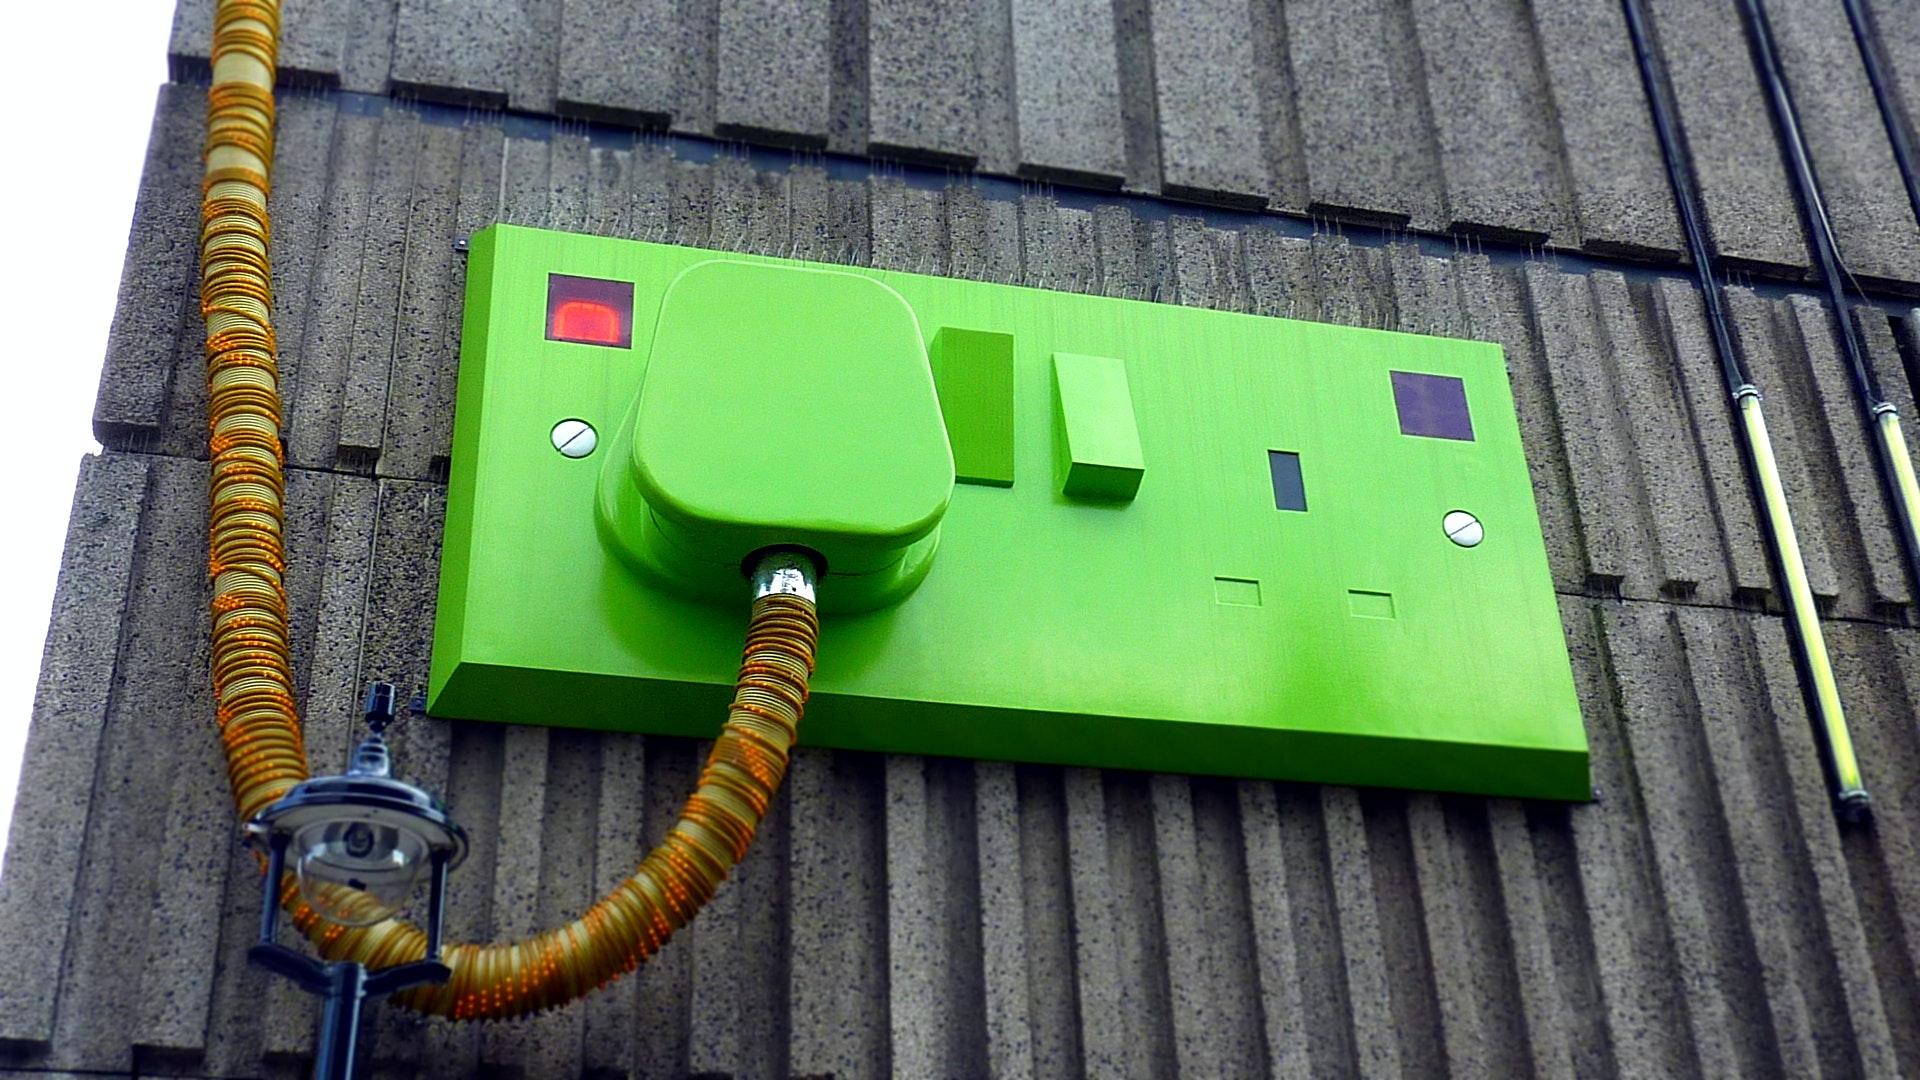 giant-plug-socket-green